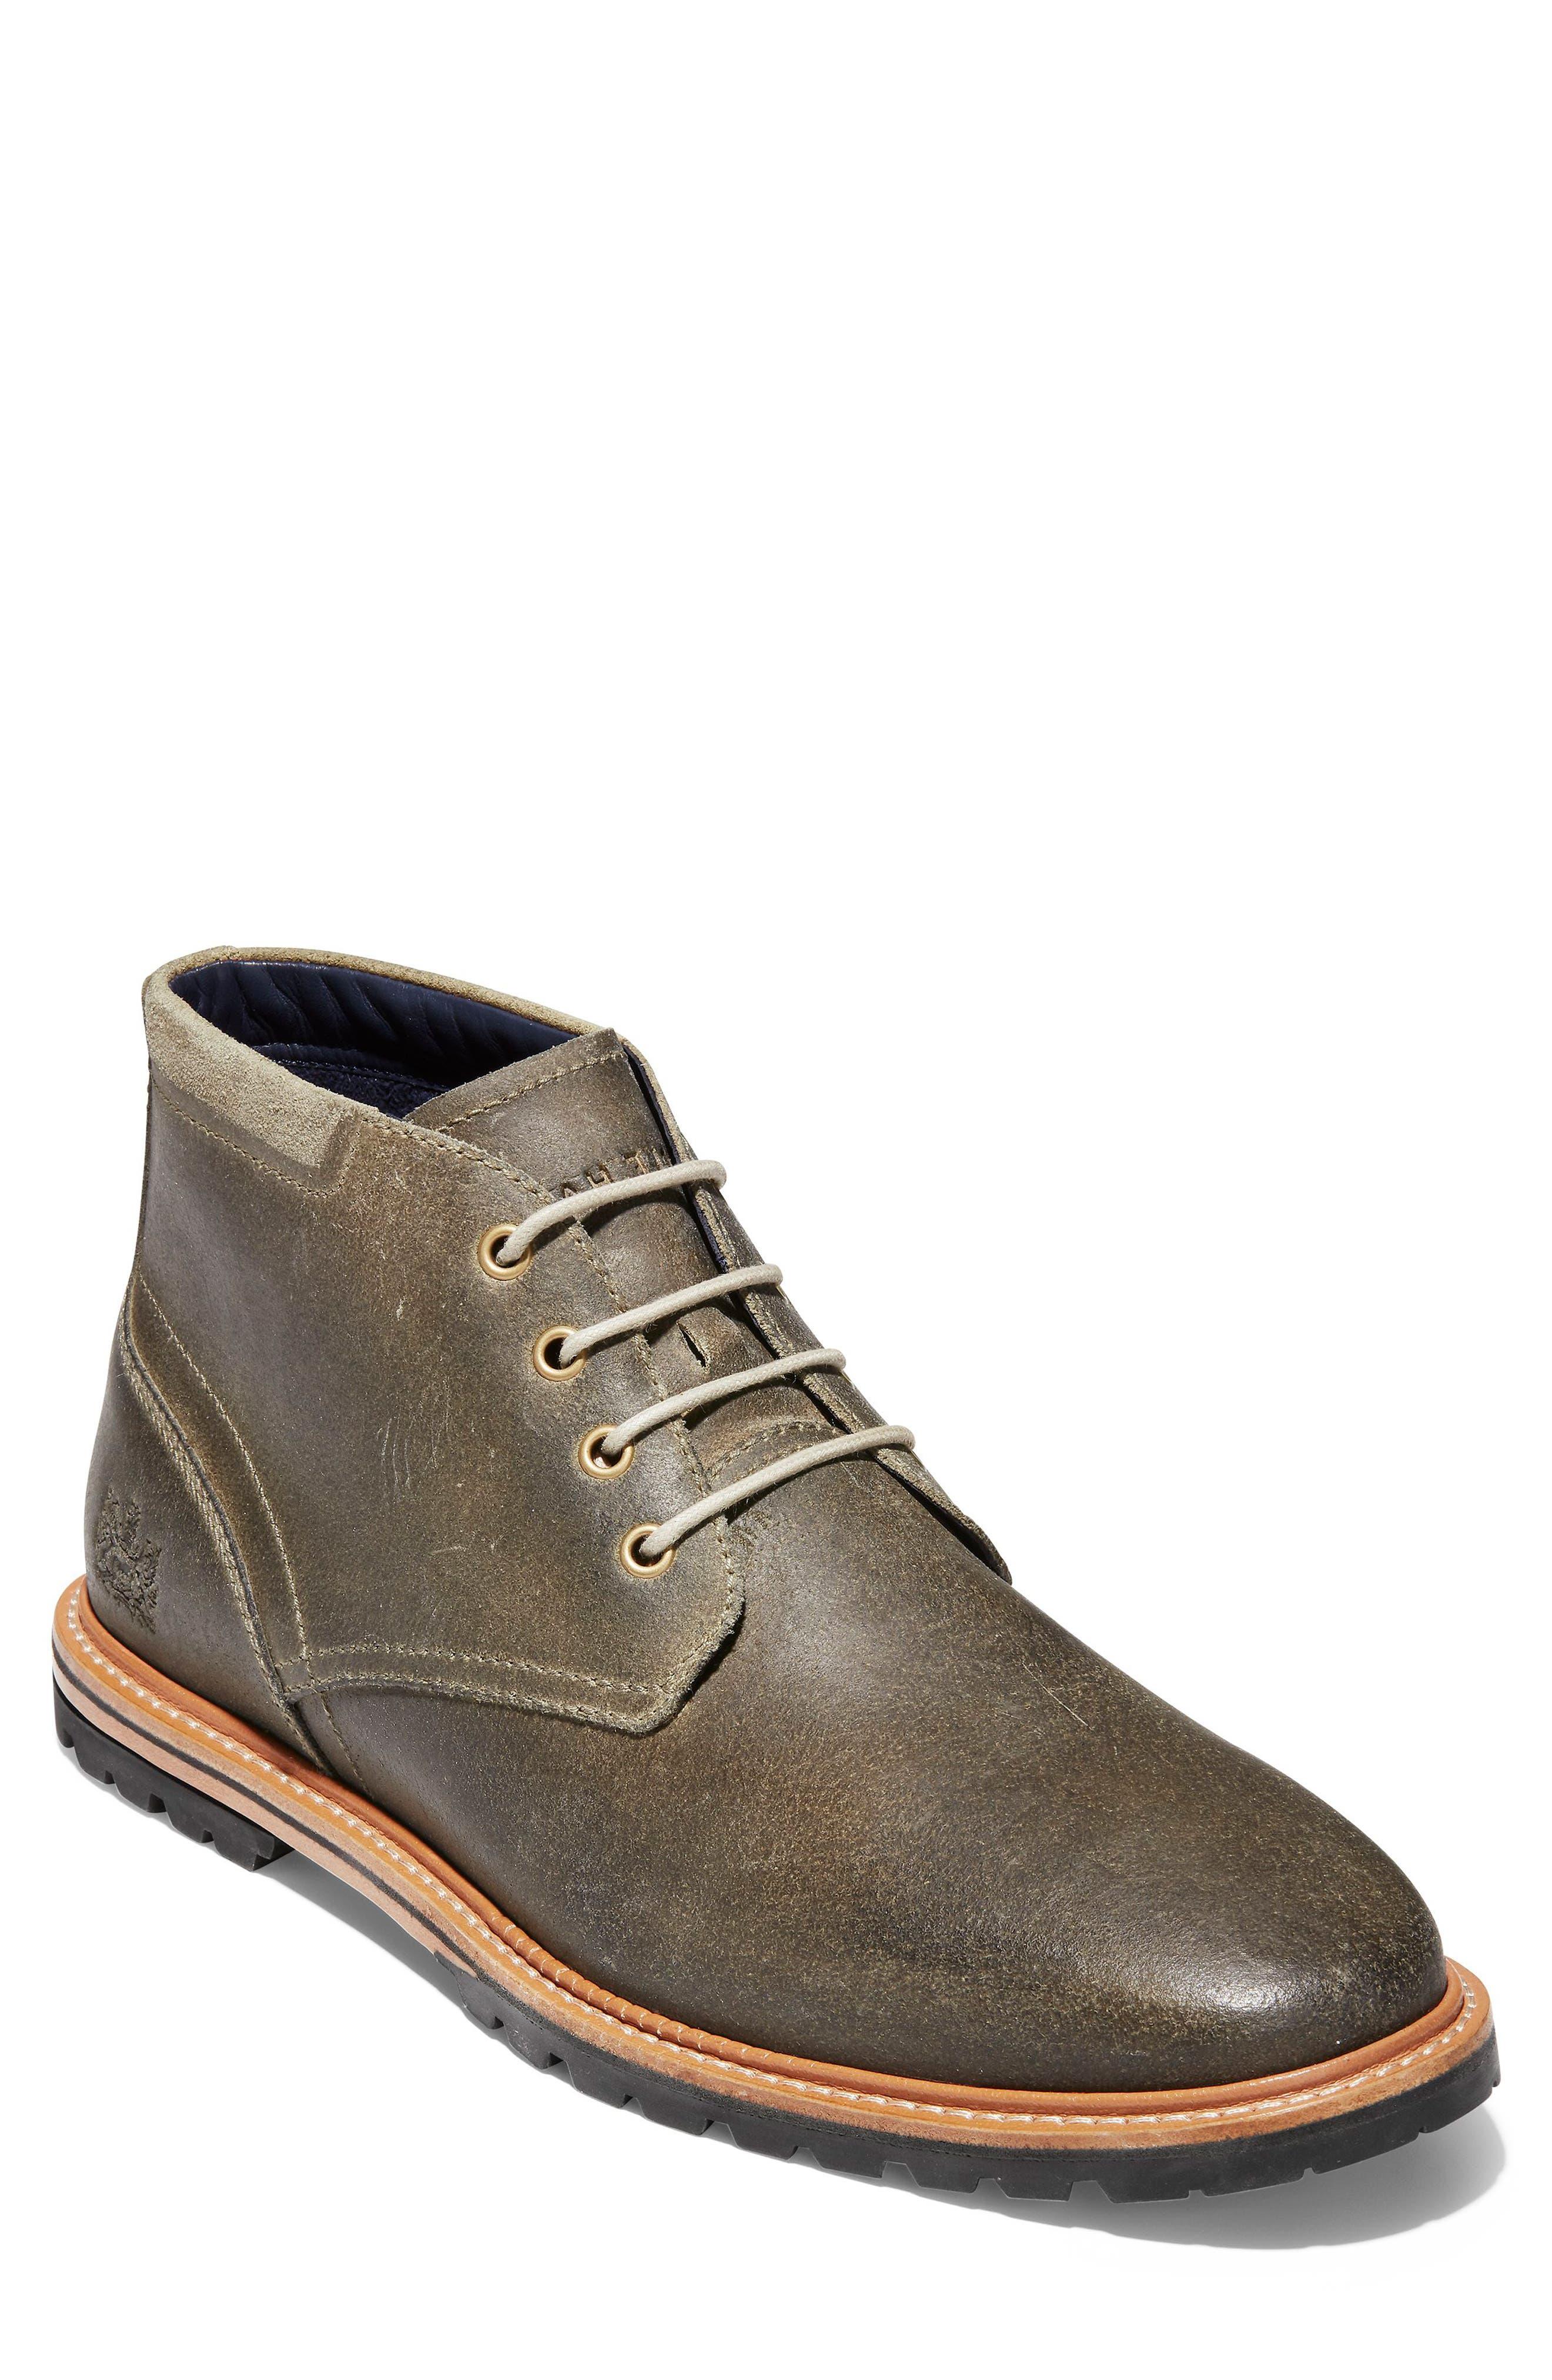 Cole Haan Raymond Grand Water Resistant Chukka Boot- Grey